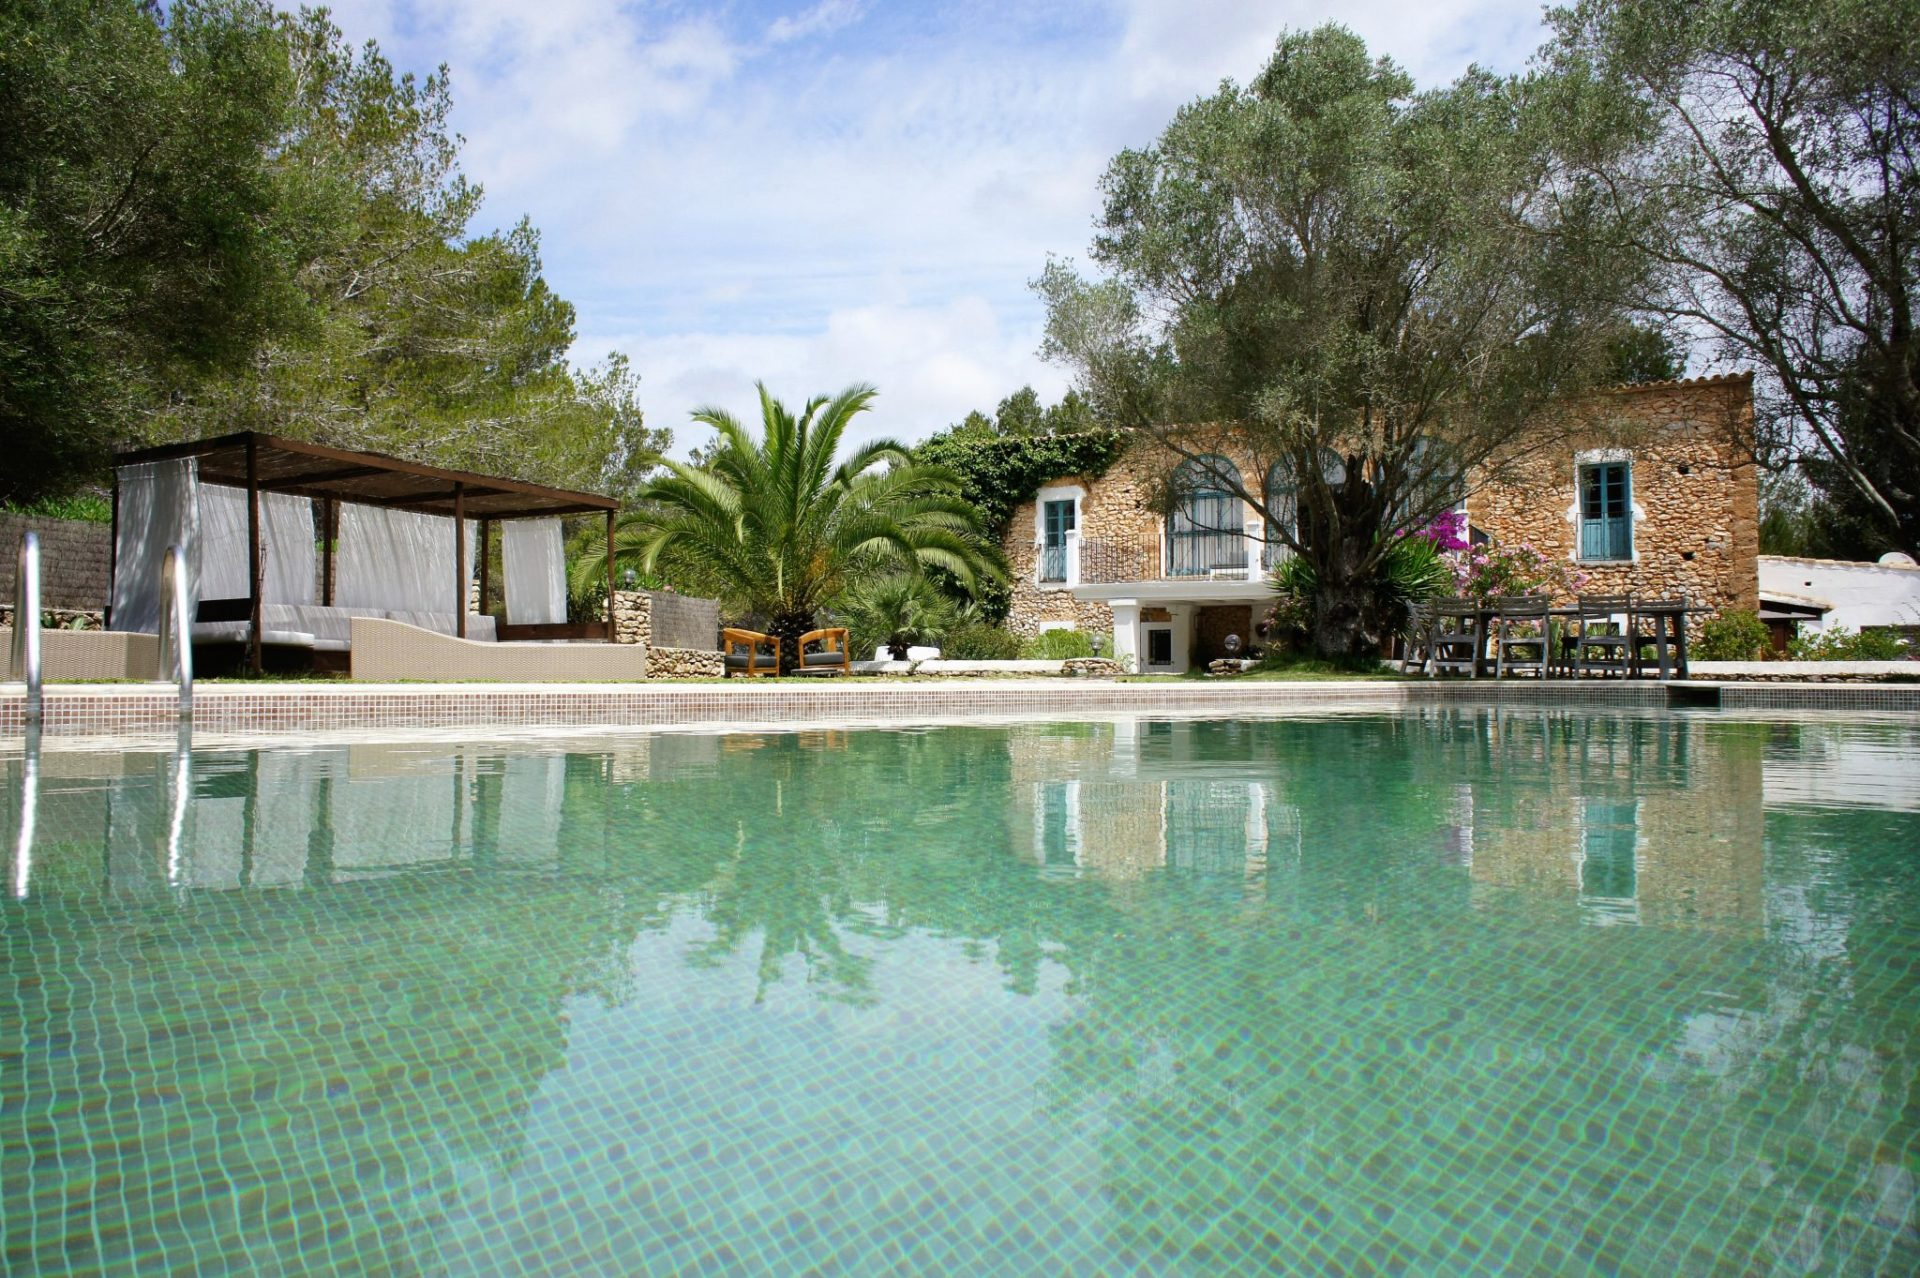 Finca Big Pool Countryside View Ibiza